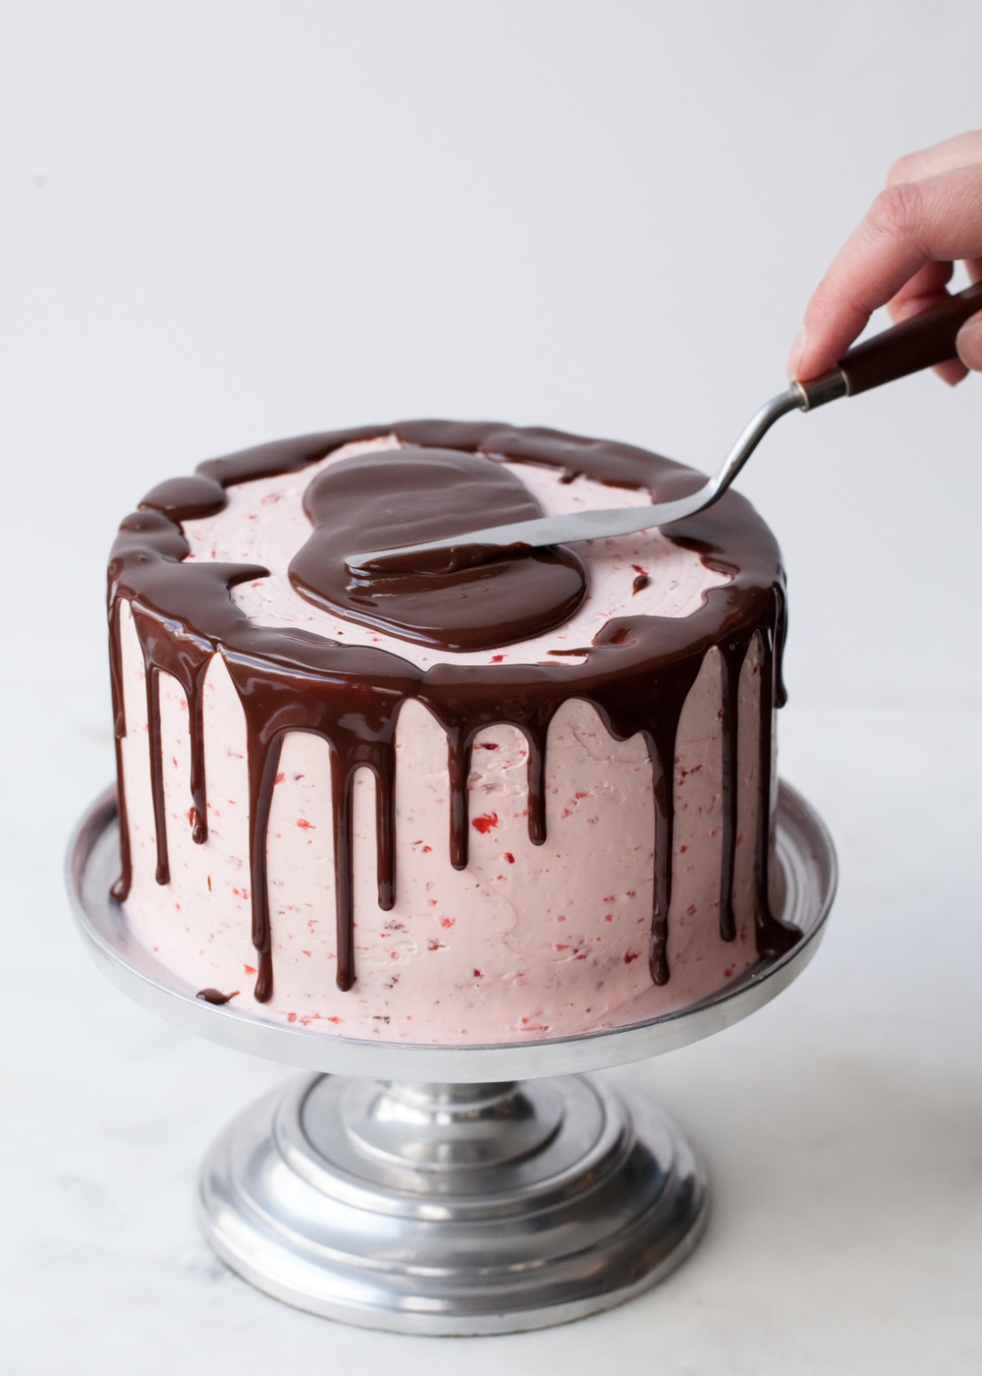 Chocolate-Dipped+Strawberry+Cake (1).jpeg